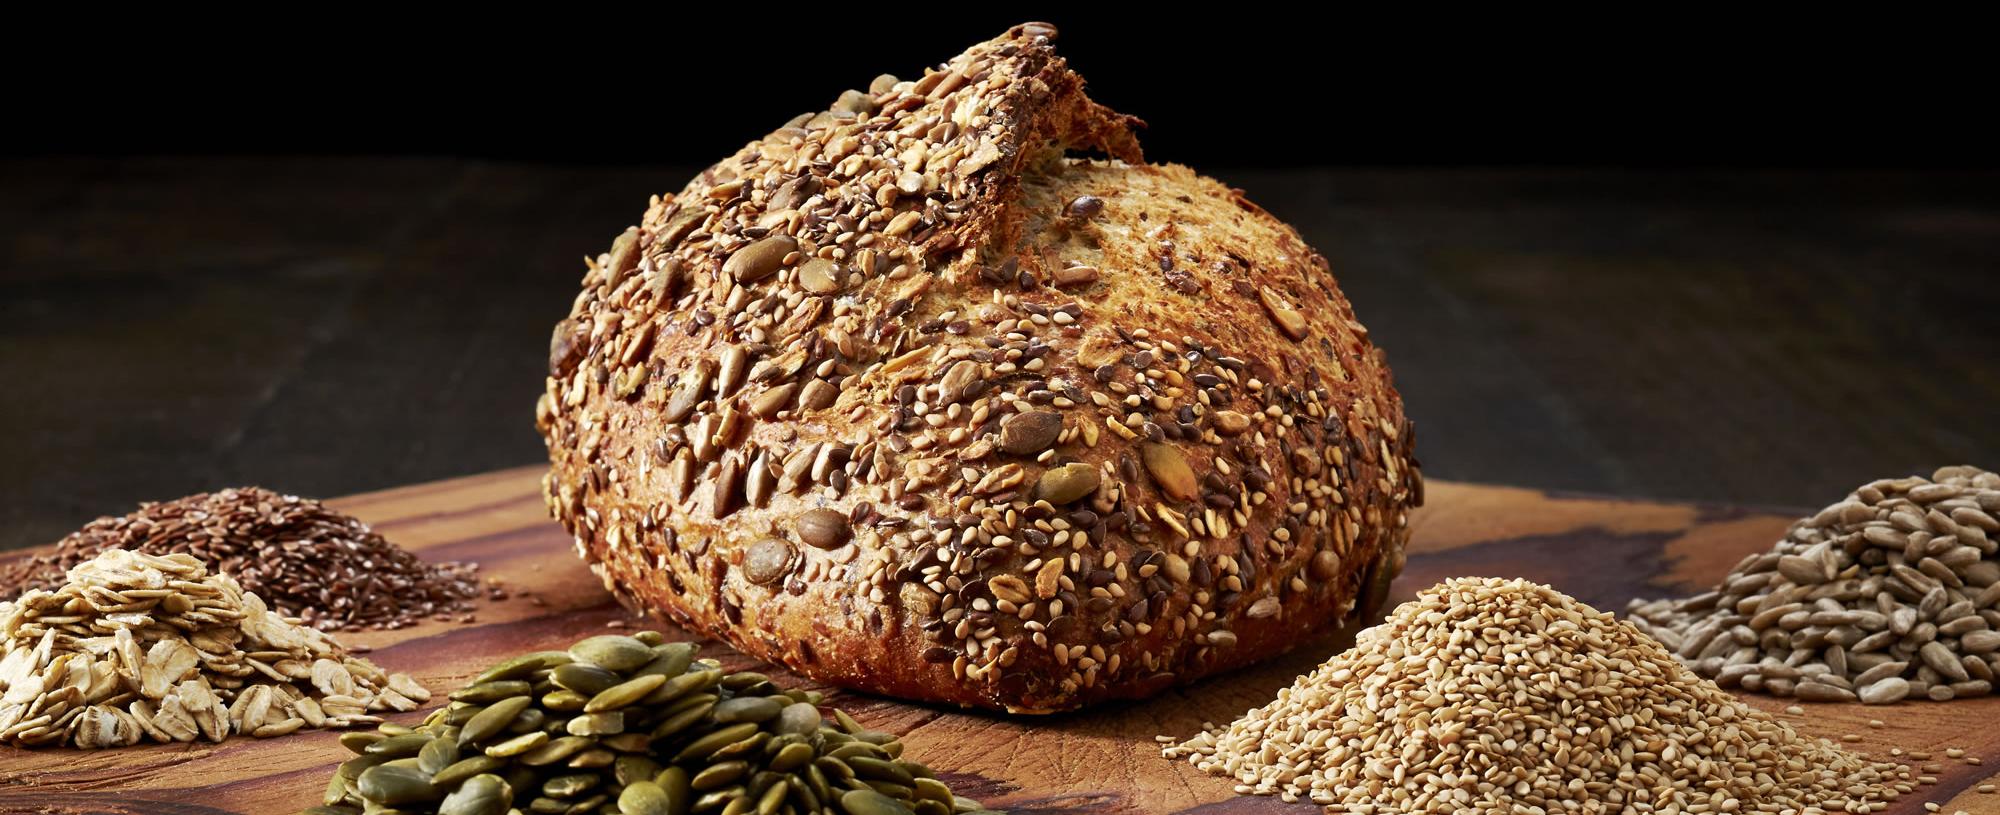 2000x815_Harvest Bread 8293